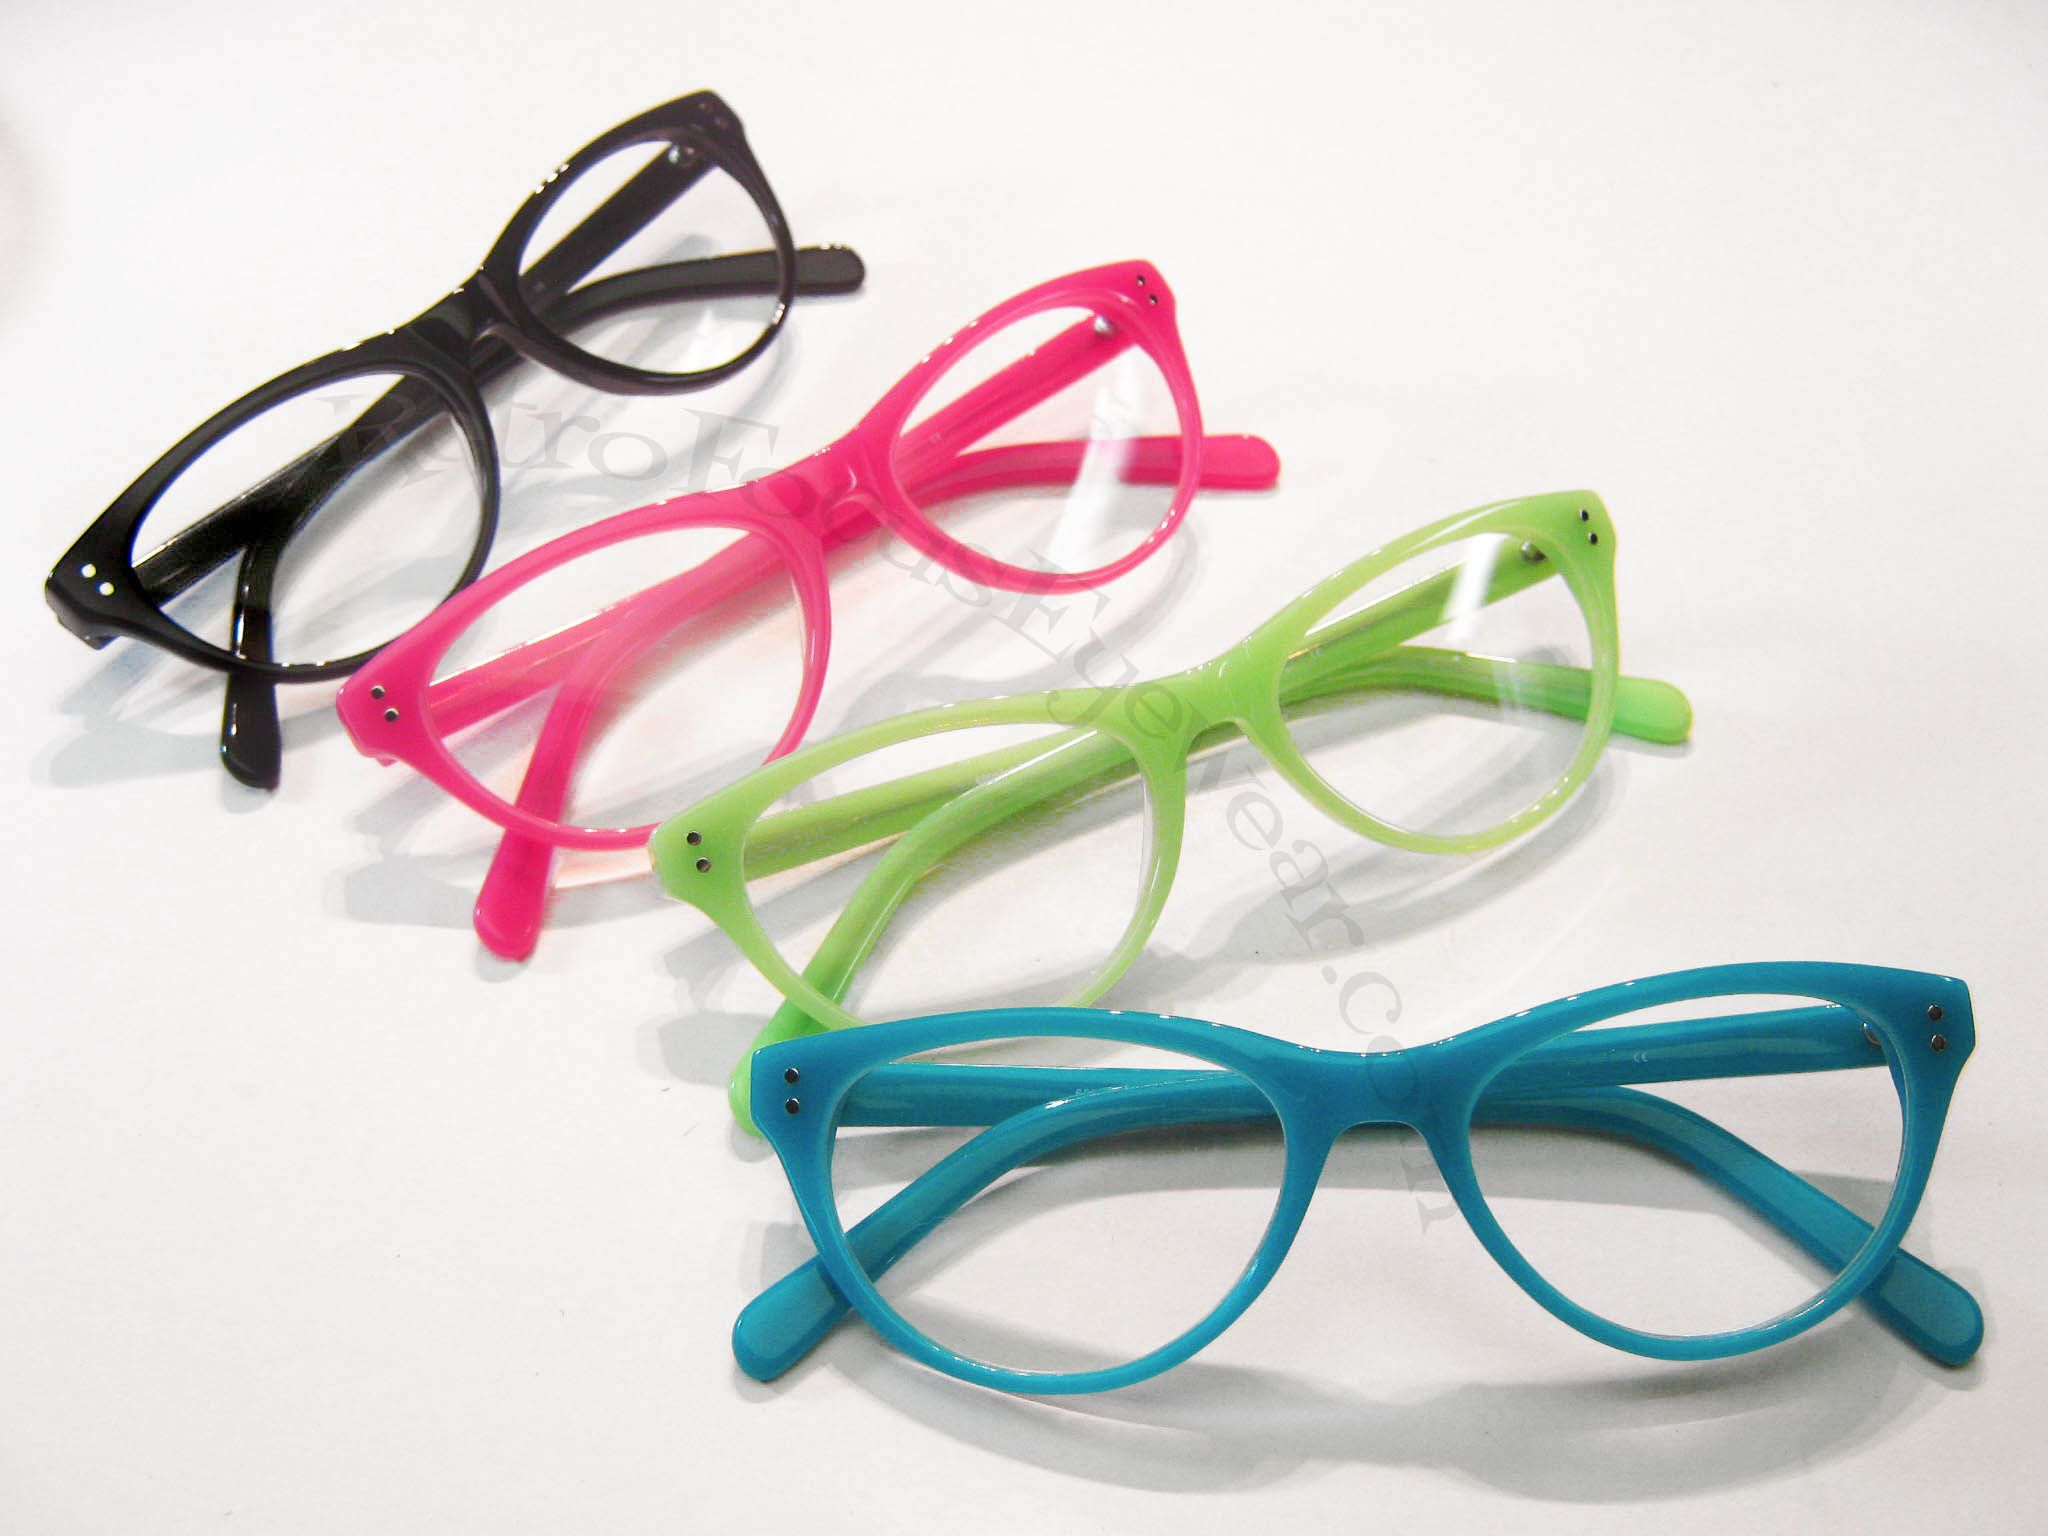 c2675a1fda4c Wicked Cat Eyes, Optical Frames - Neon Cat Eye Reader | Retro Focus Eyewear